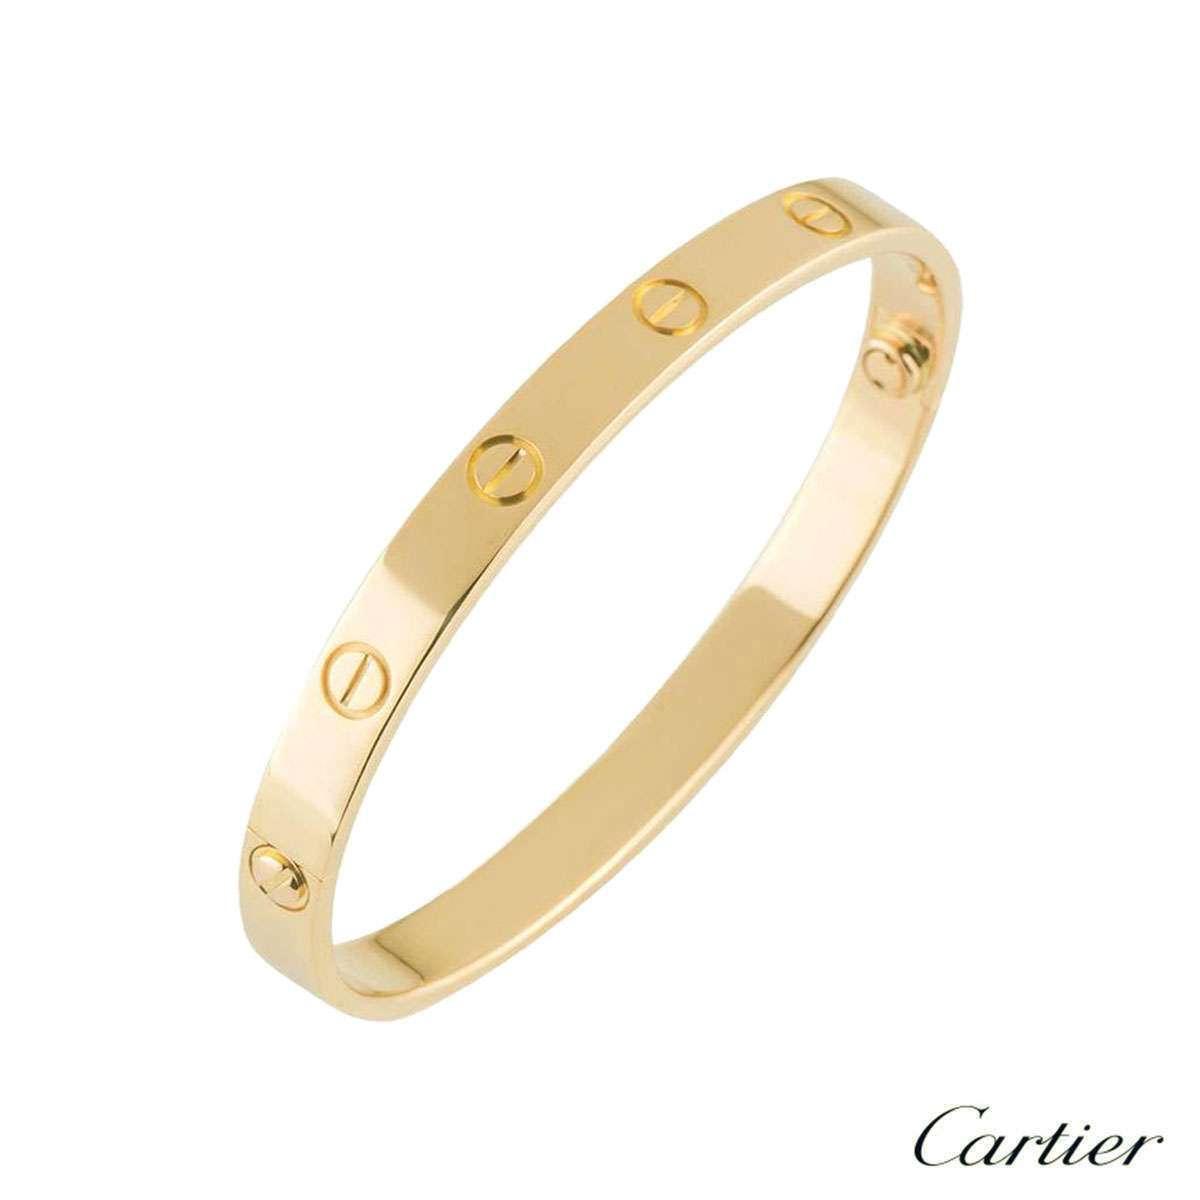 Cartier Yellow Gold Love Bracelet Size 21 B6035521